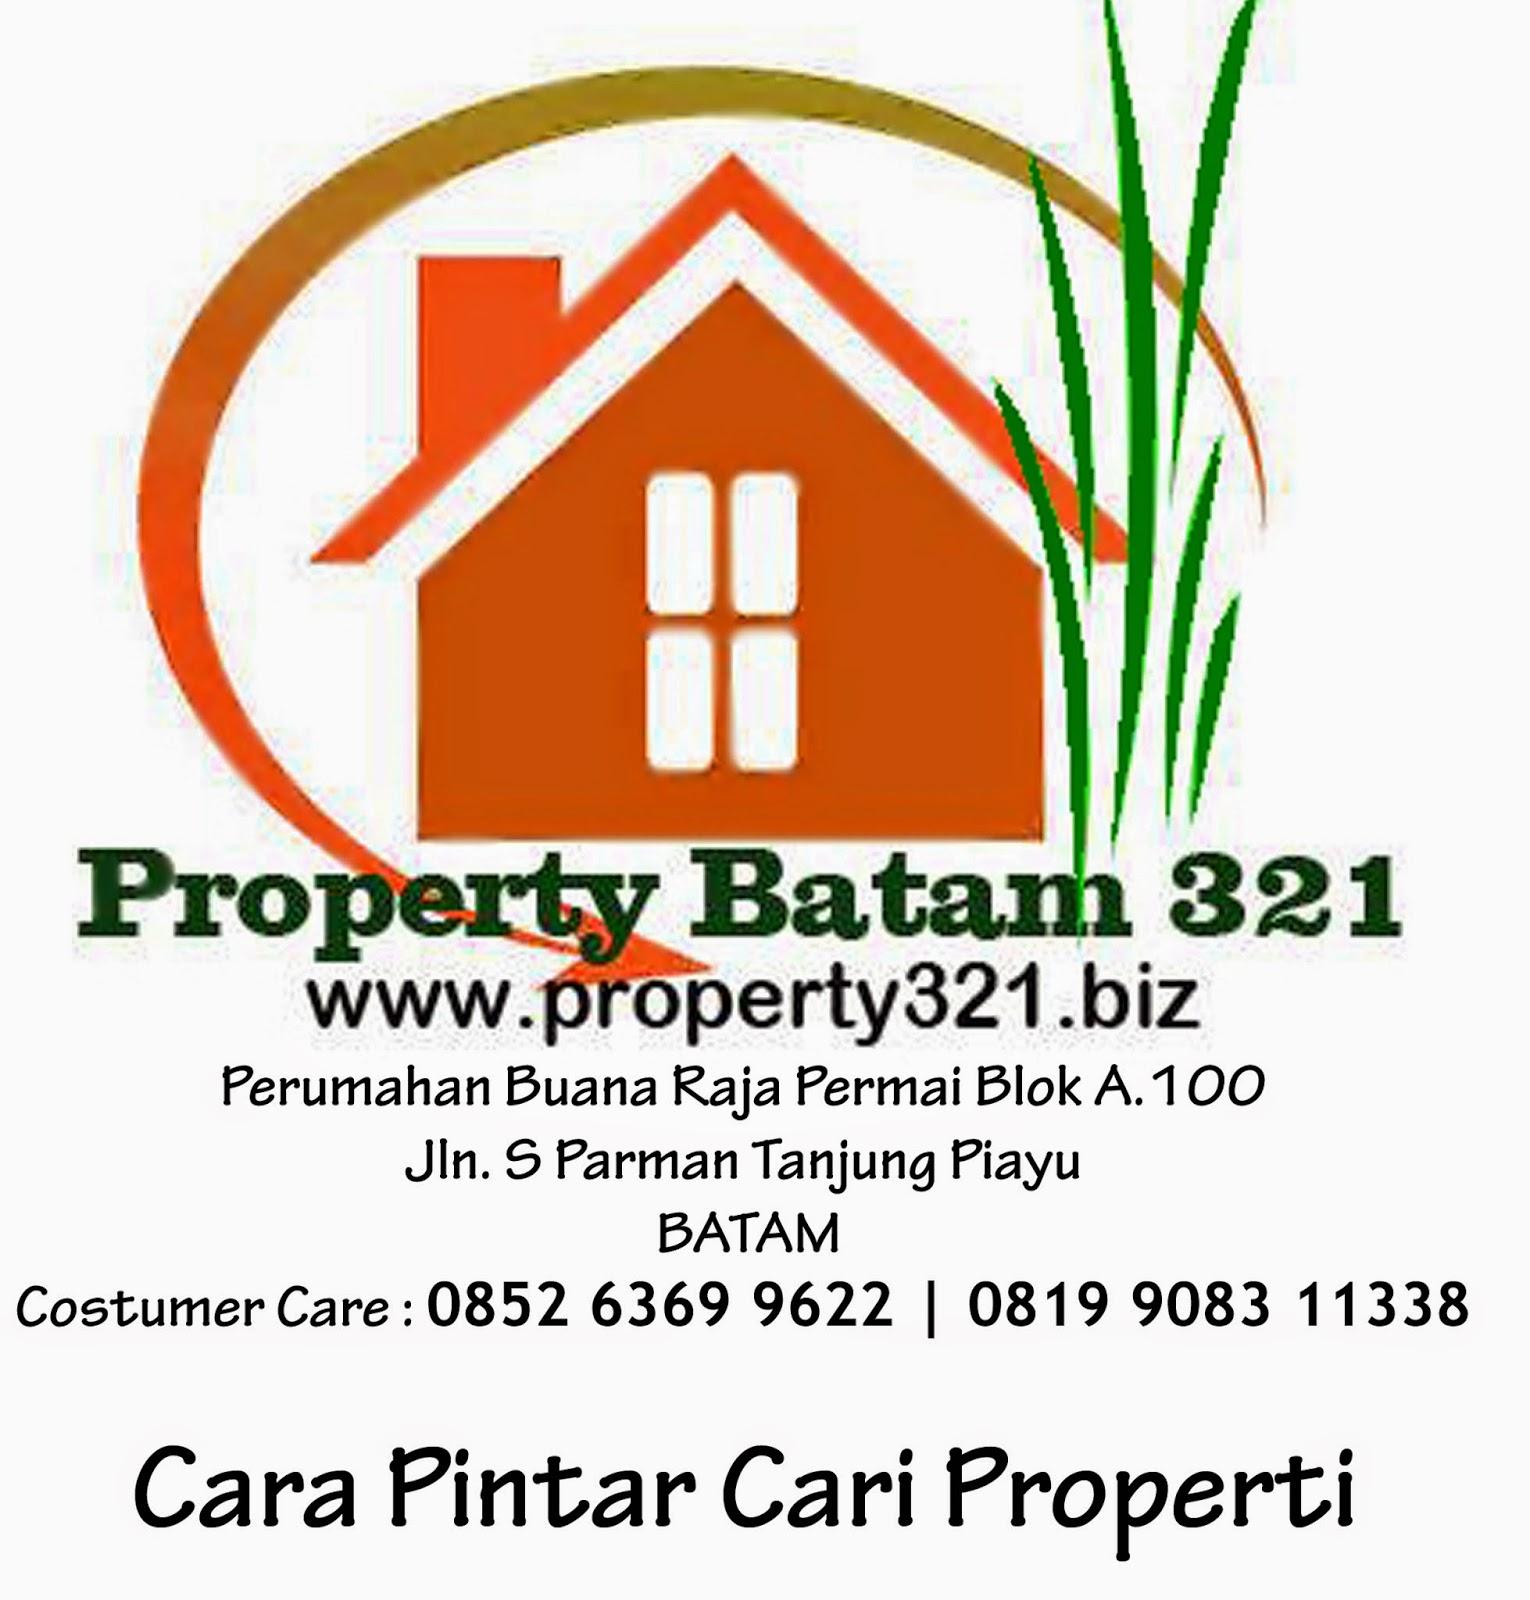 Property Batam